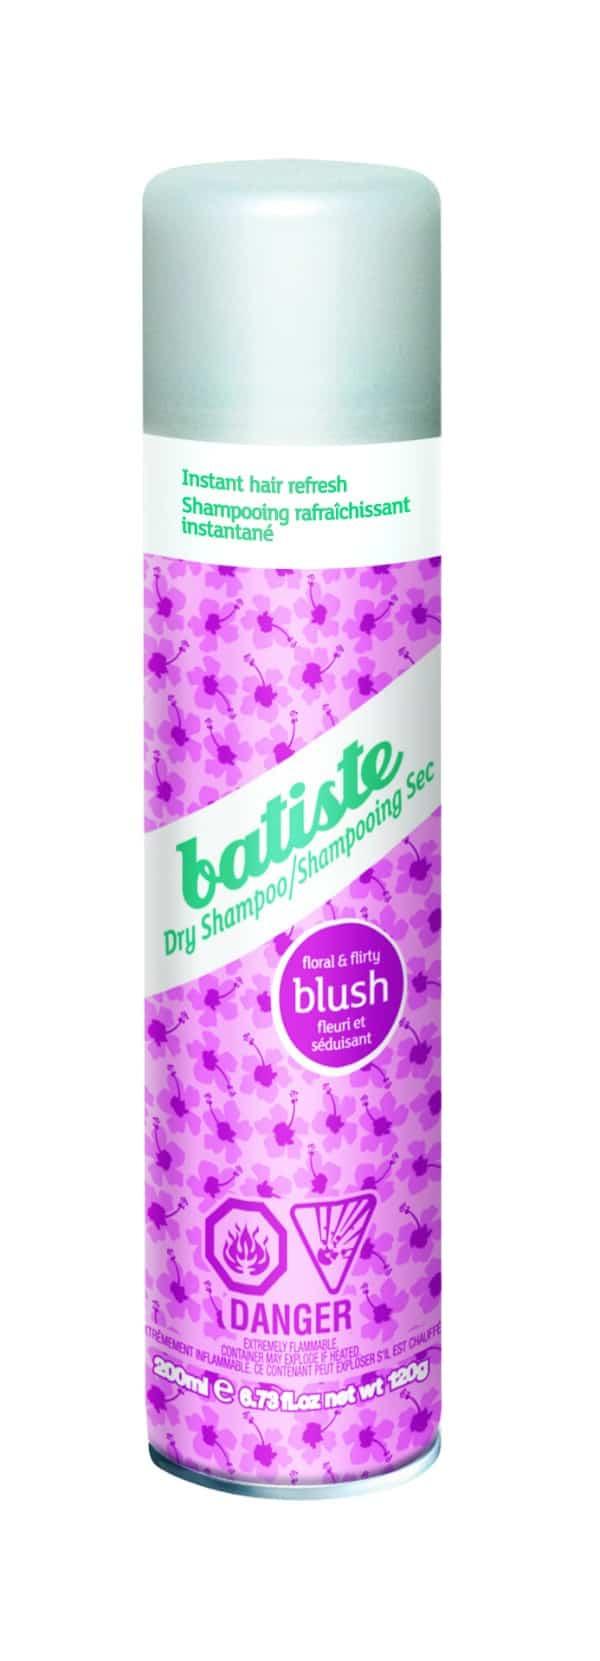 batiste-1